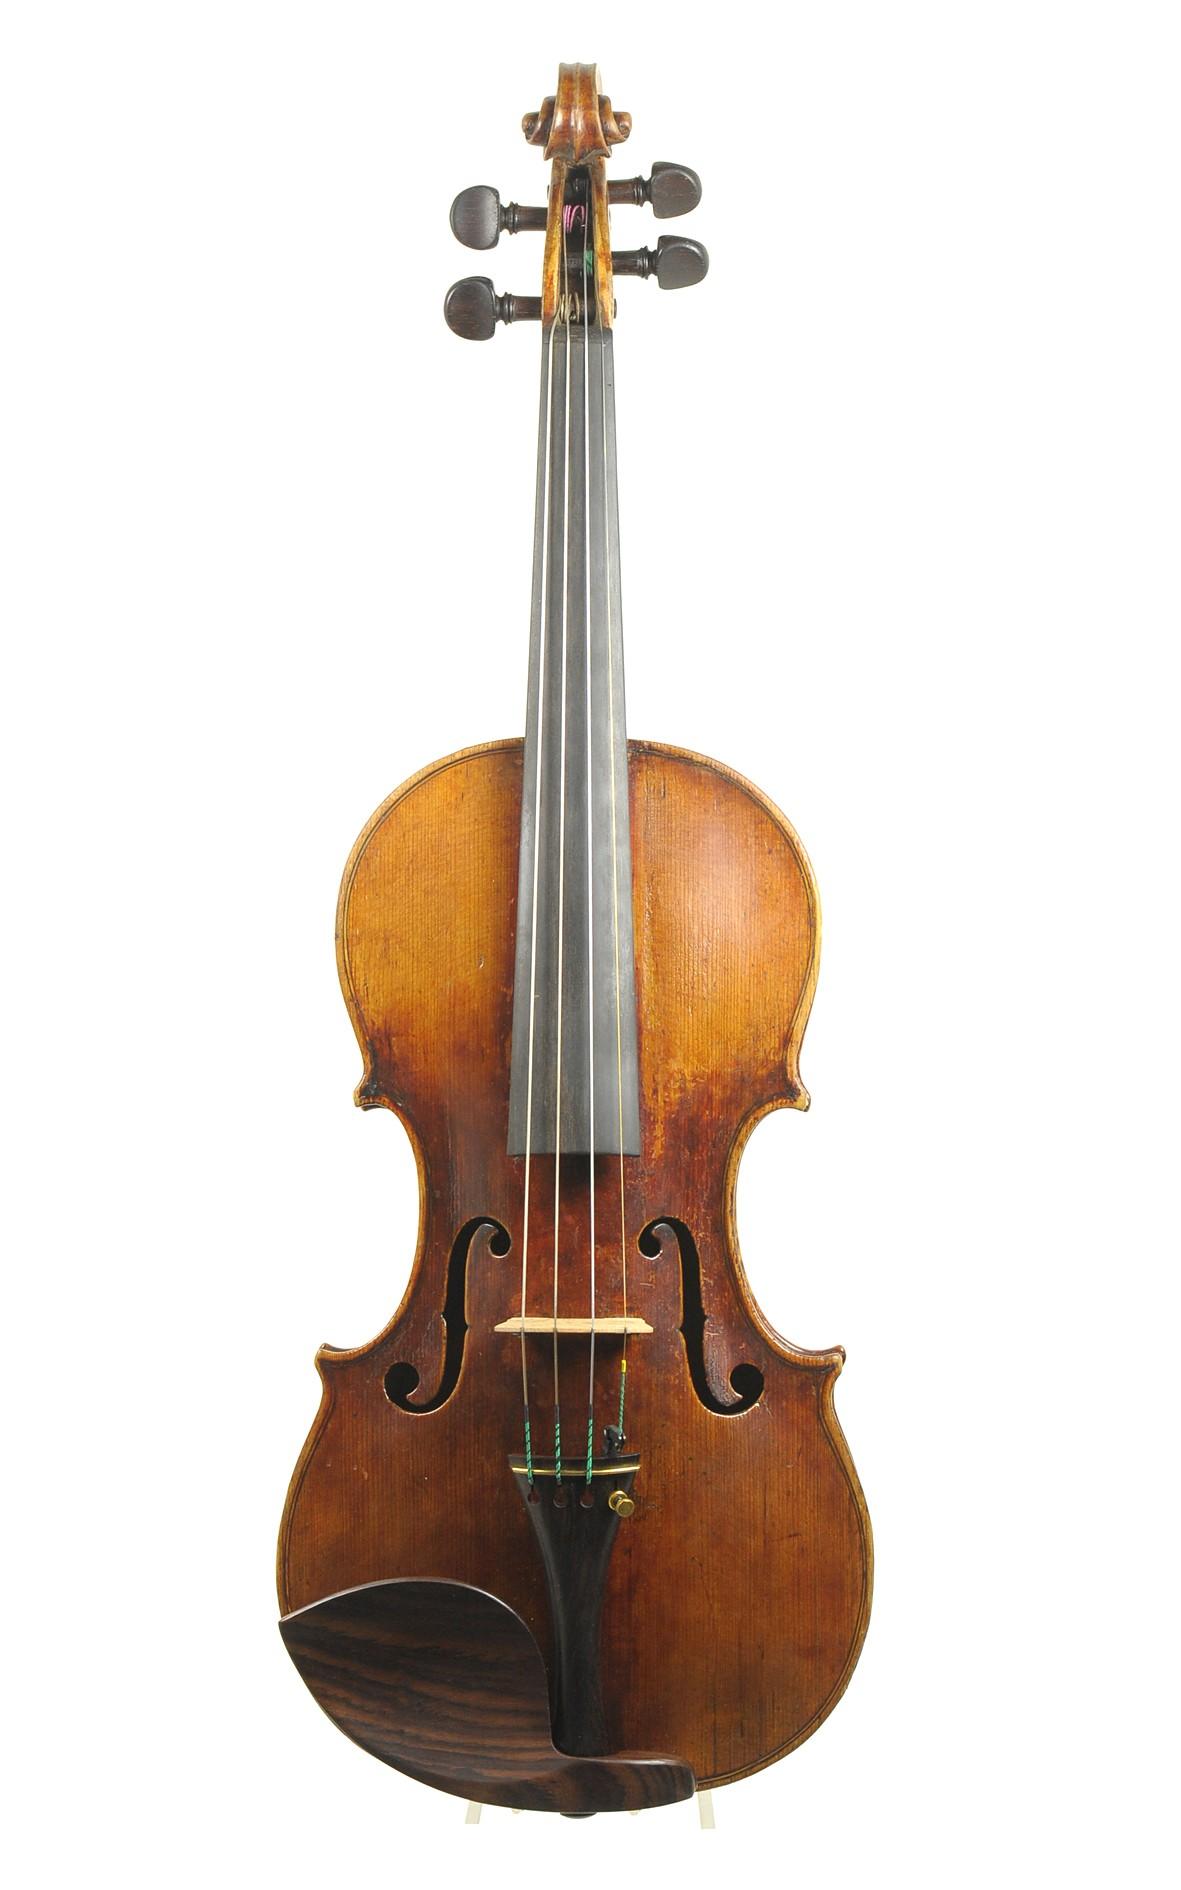 Fine Italian master violin from the 18th century